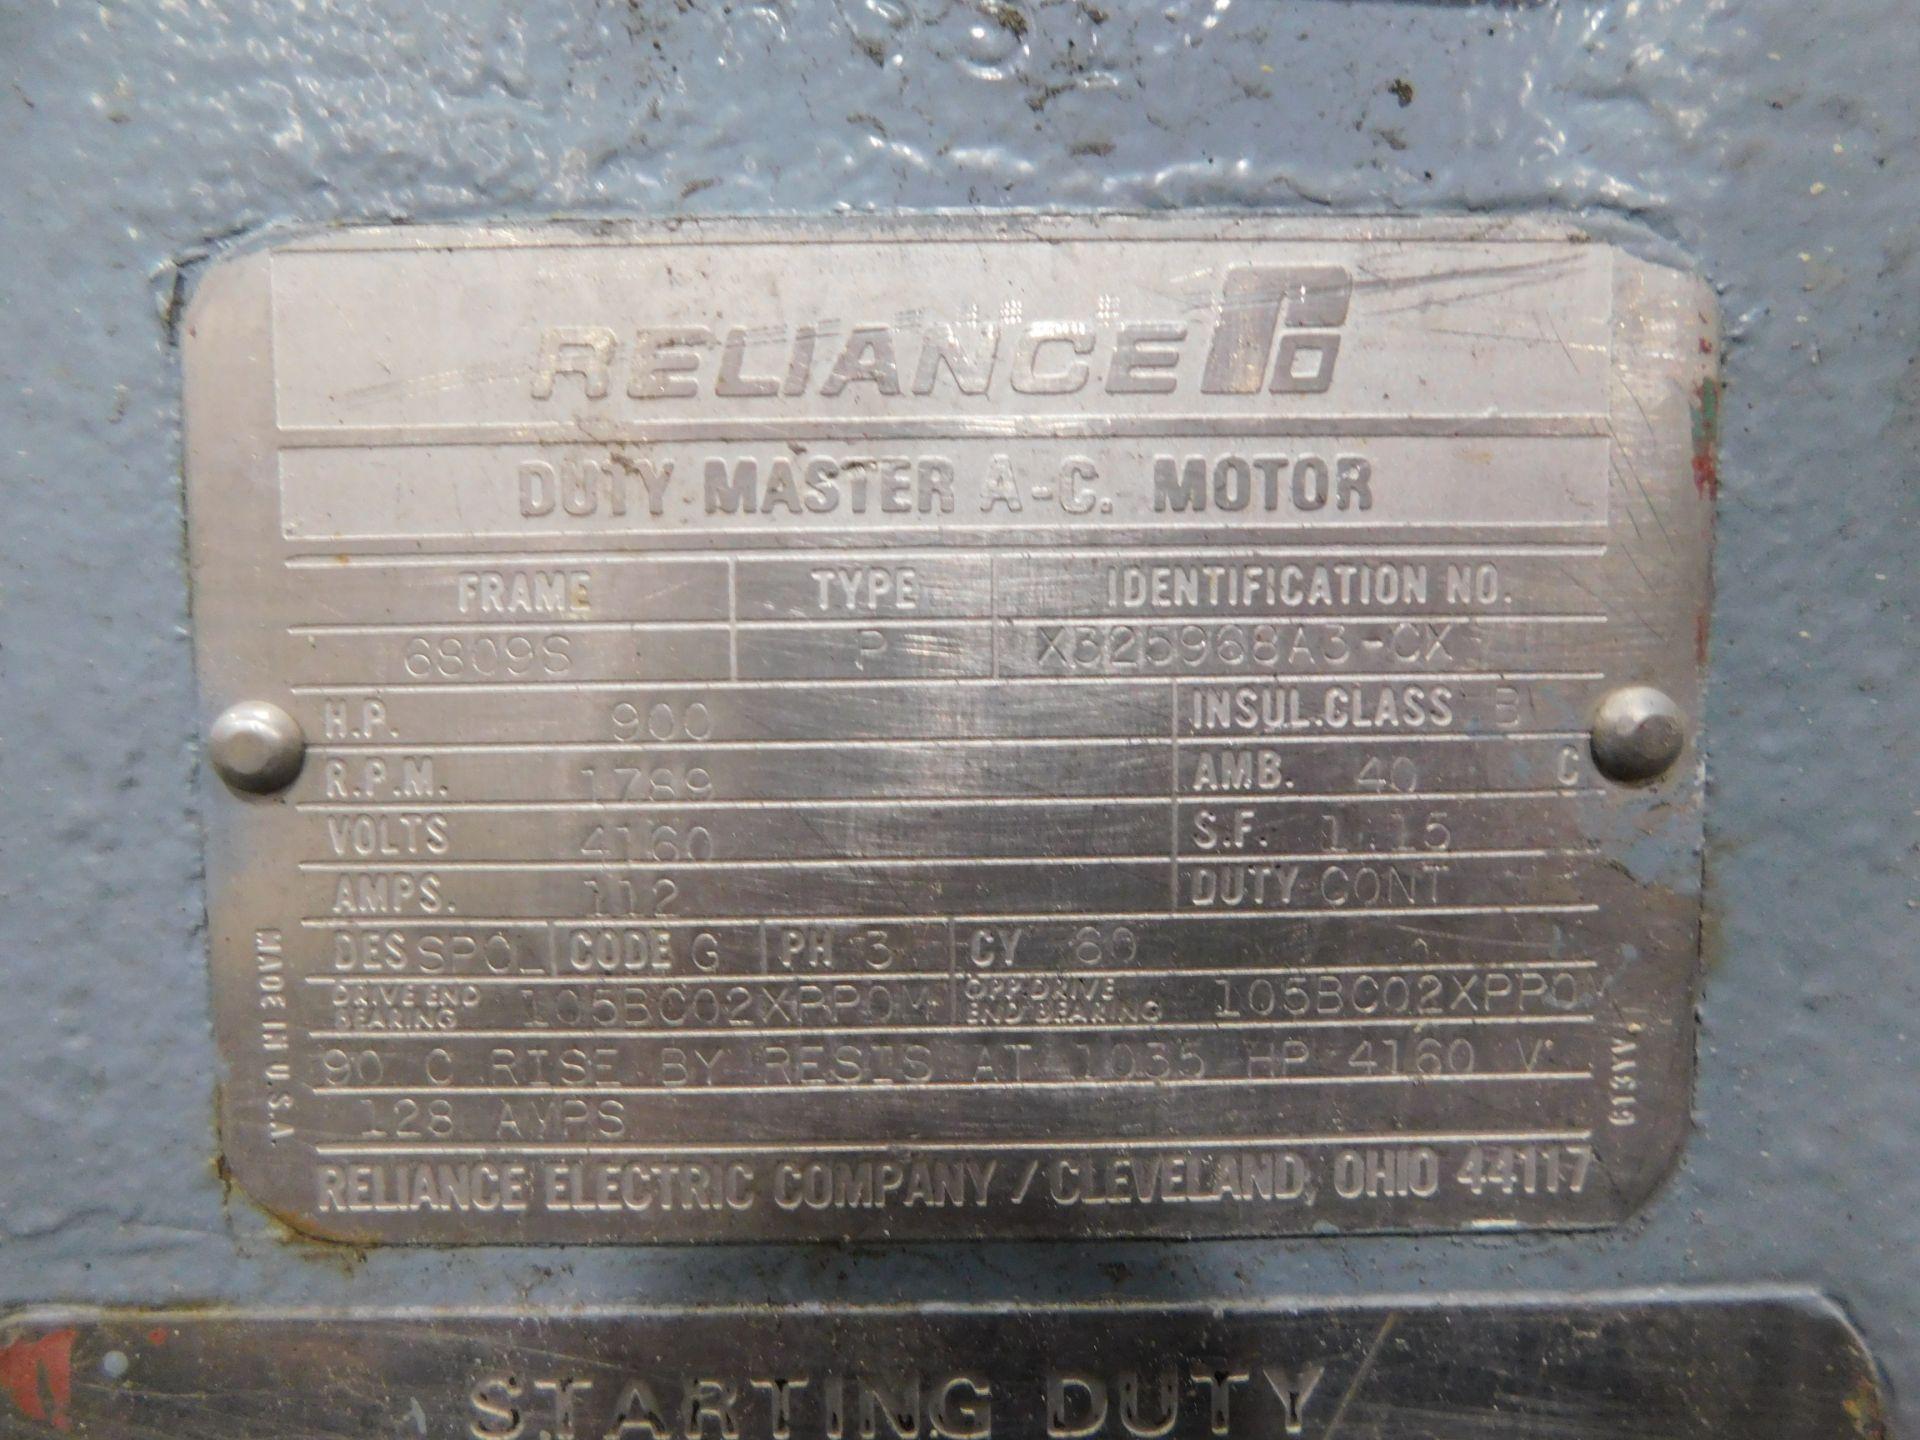 Reliance AC Duty Master Motor. 900 HP. 3 Ph. 60 Hz. 4160 V. 1789 RPM. 6809S. Type P. - Image 8 of 10